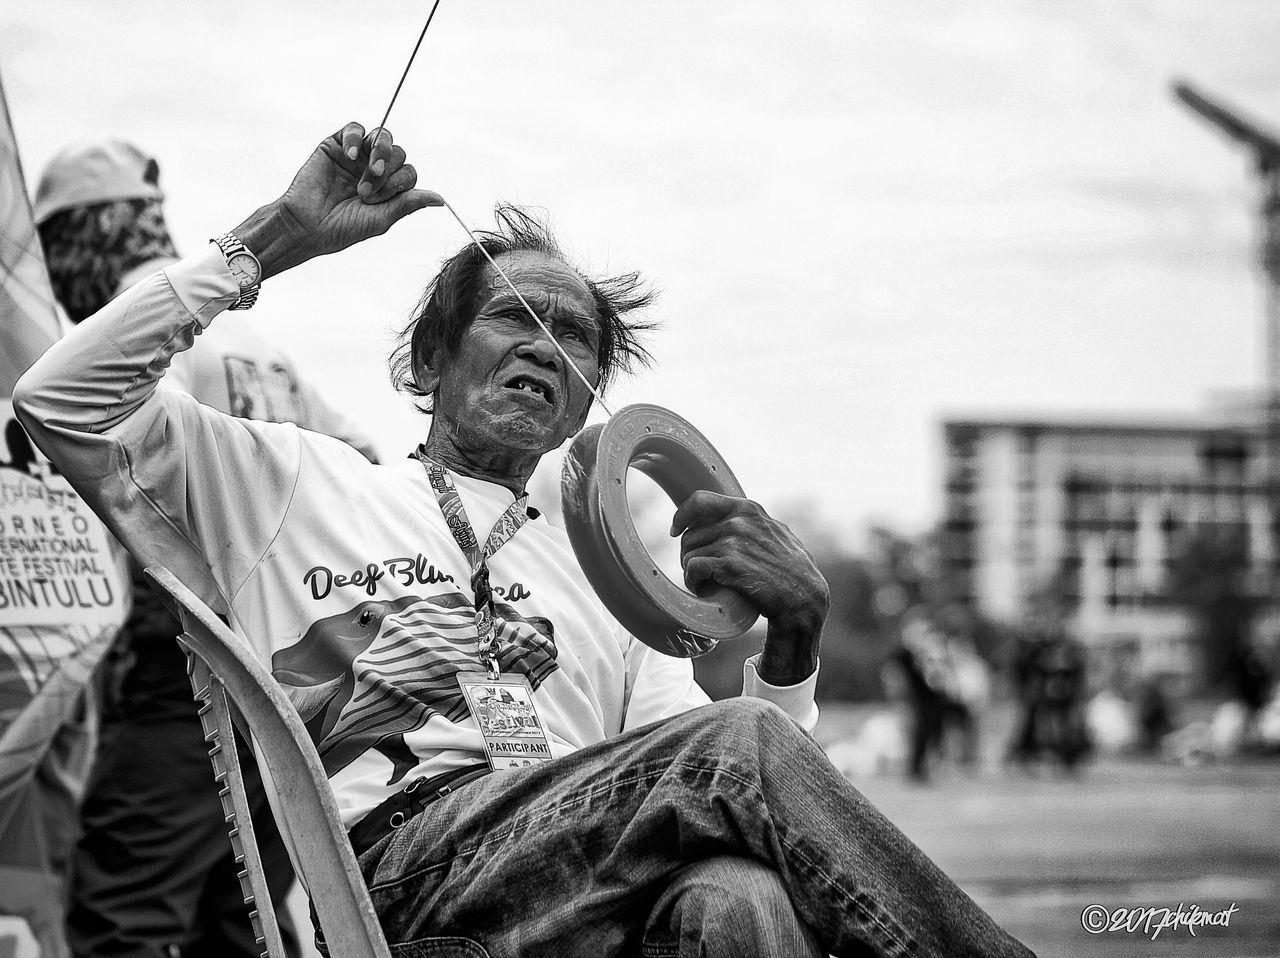 MAN SITTING ON HOLDING UMBRELLA